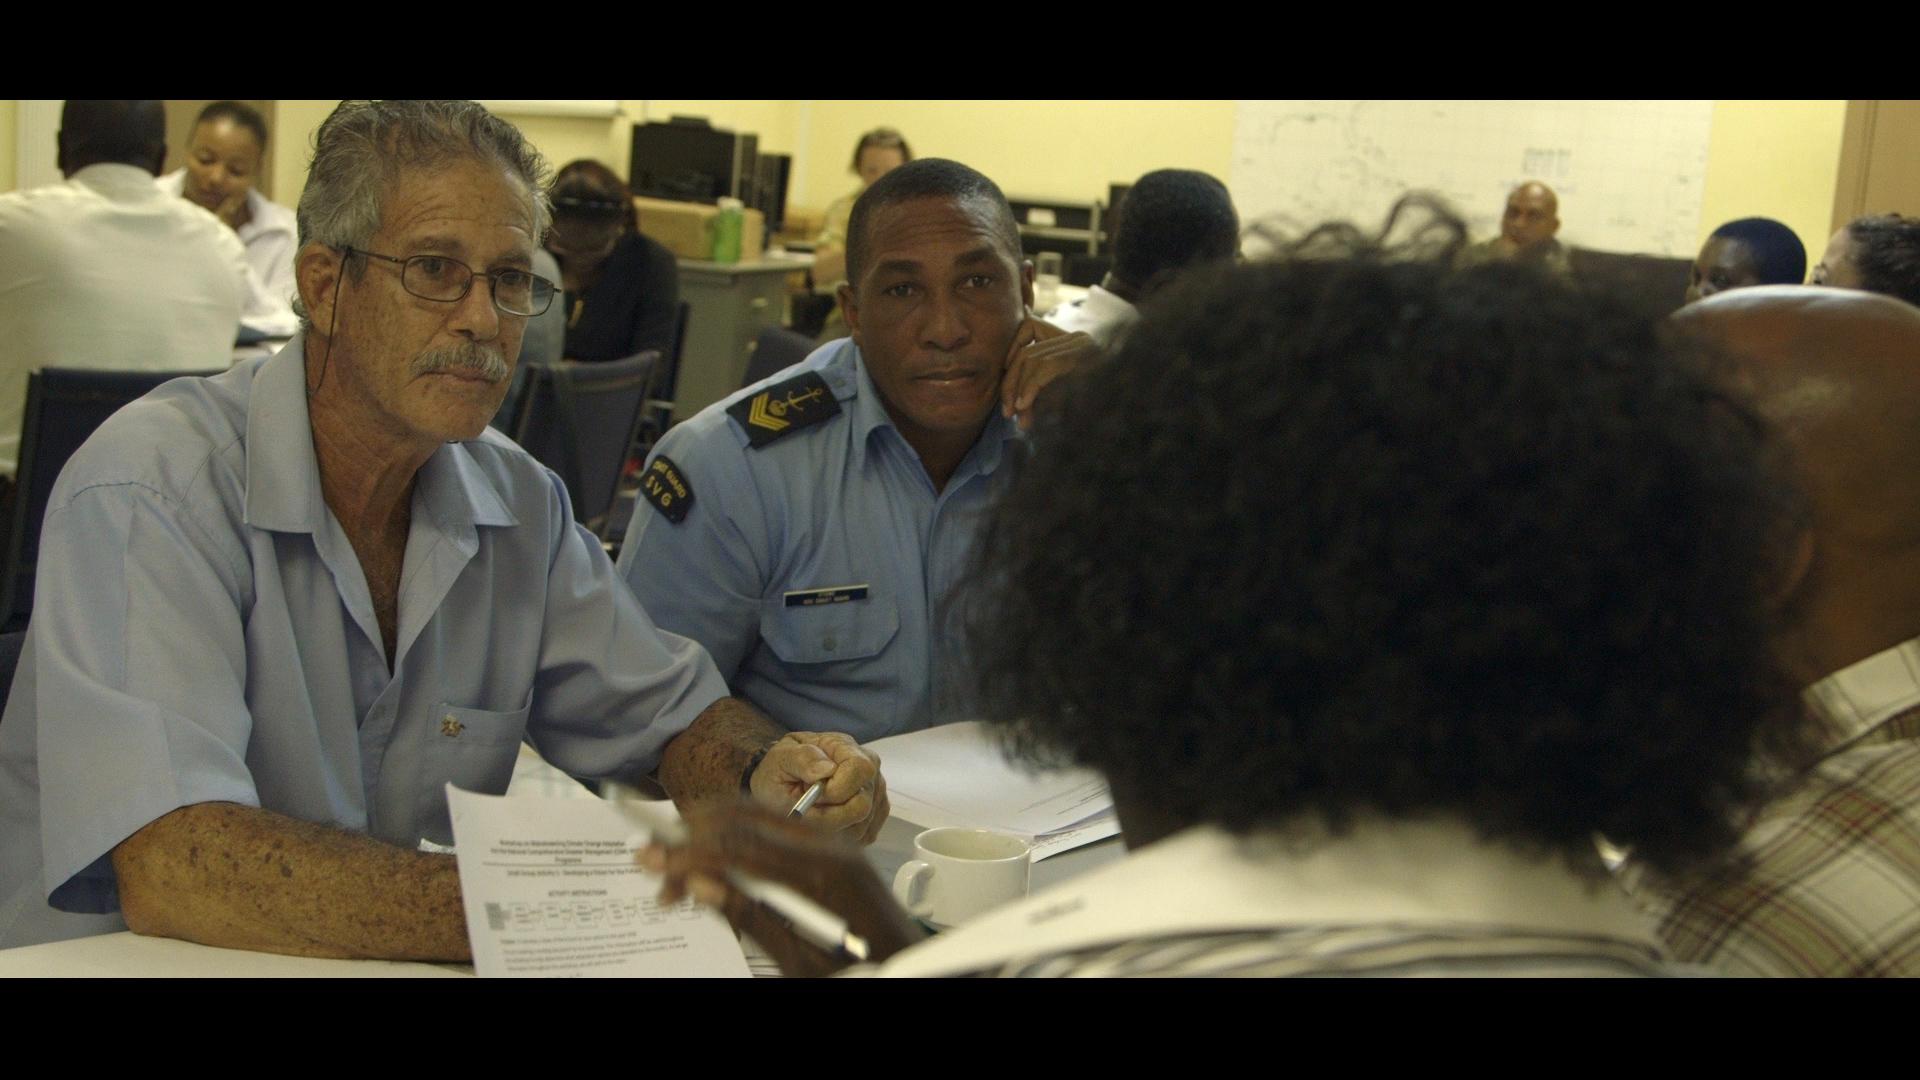 Herman Belmar & Coast Guard CPO Doninique Stowe at CDEMA workshop. - Video Still